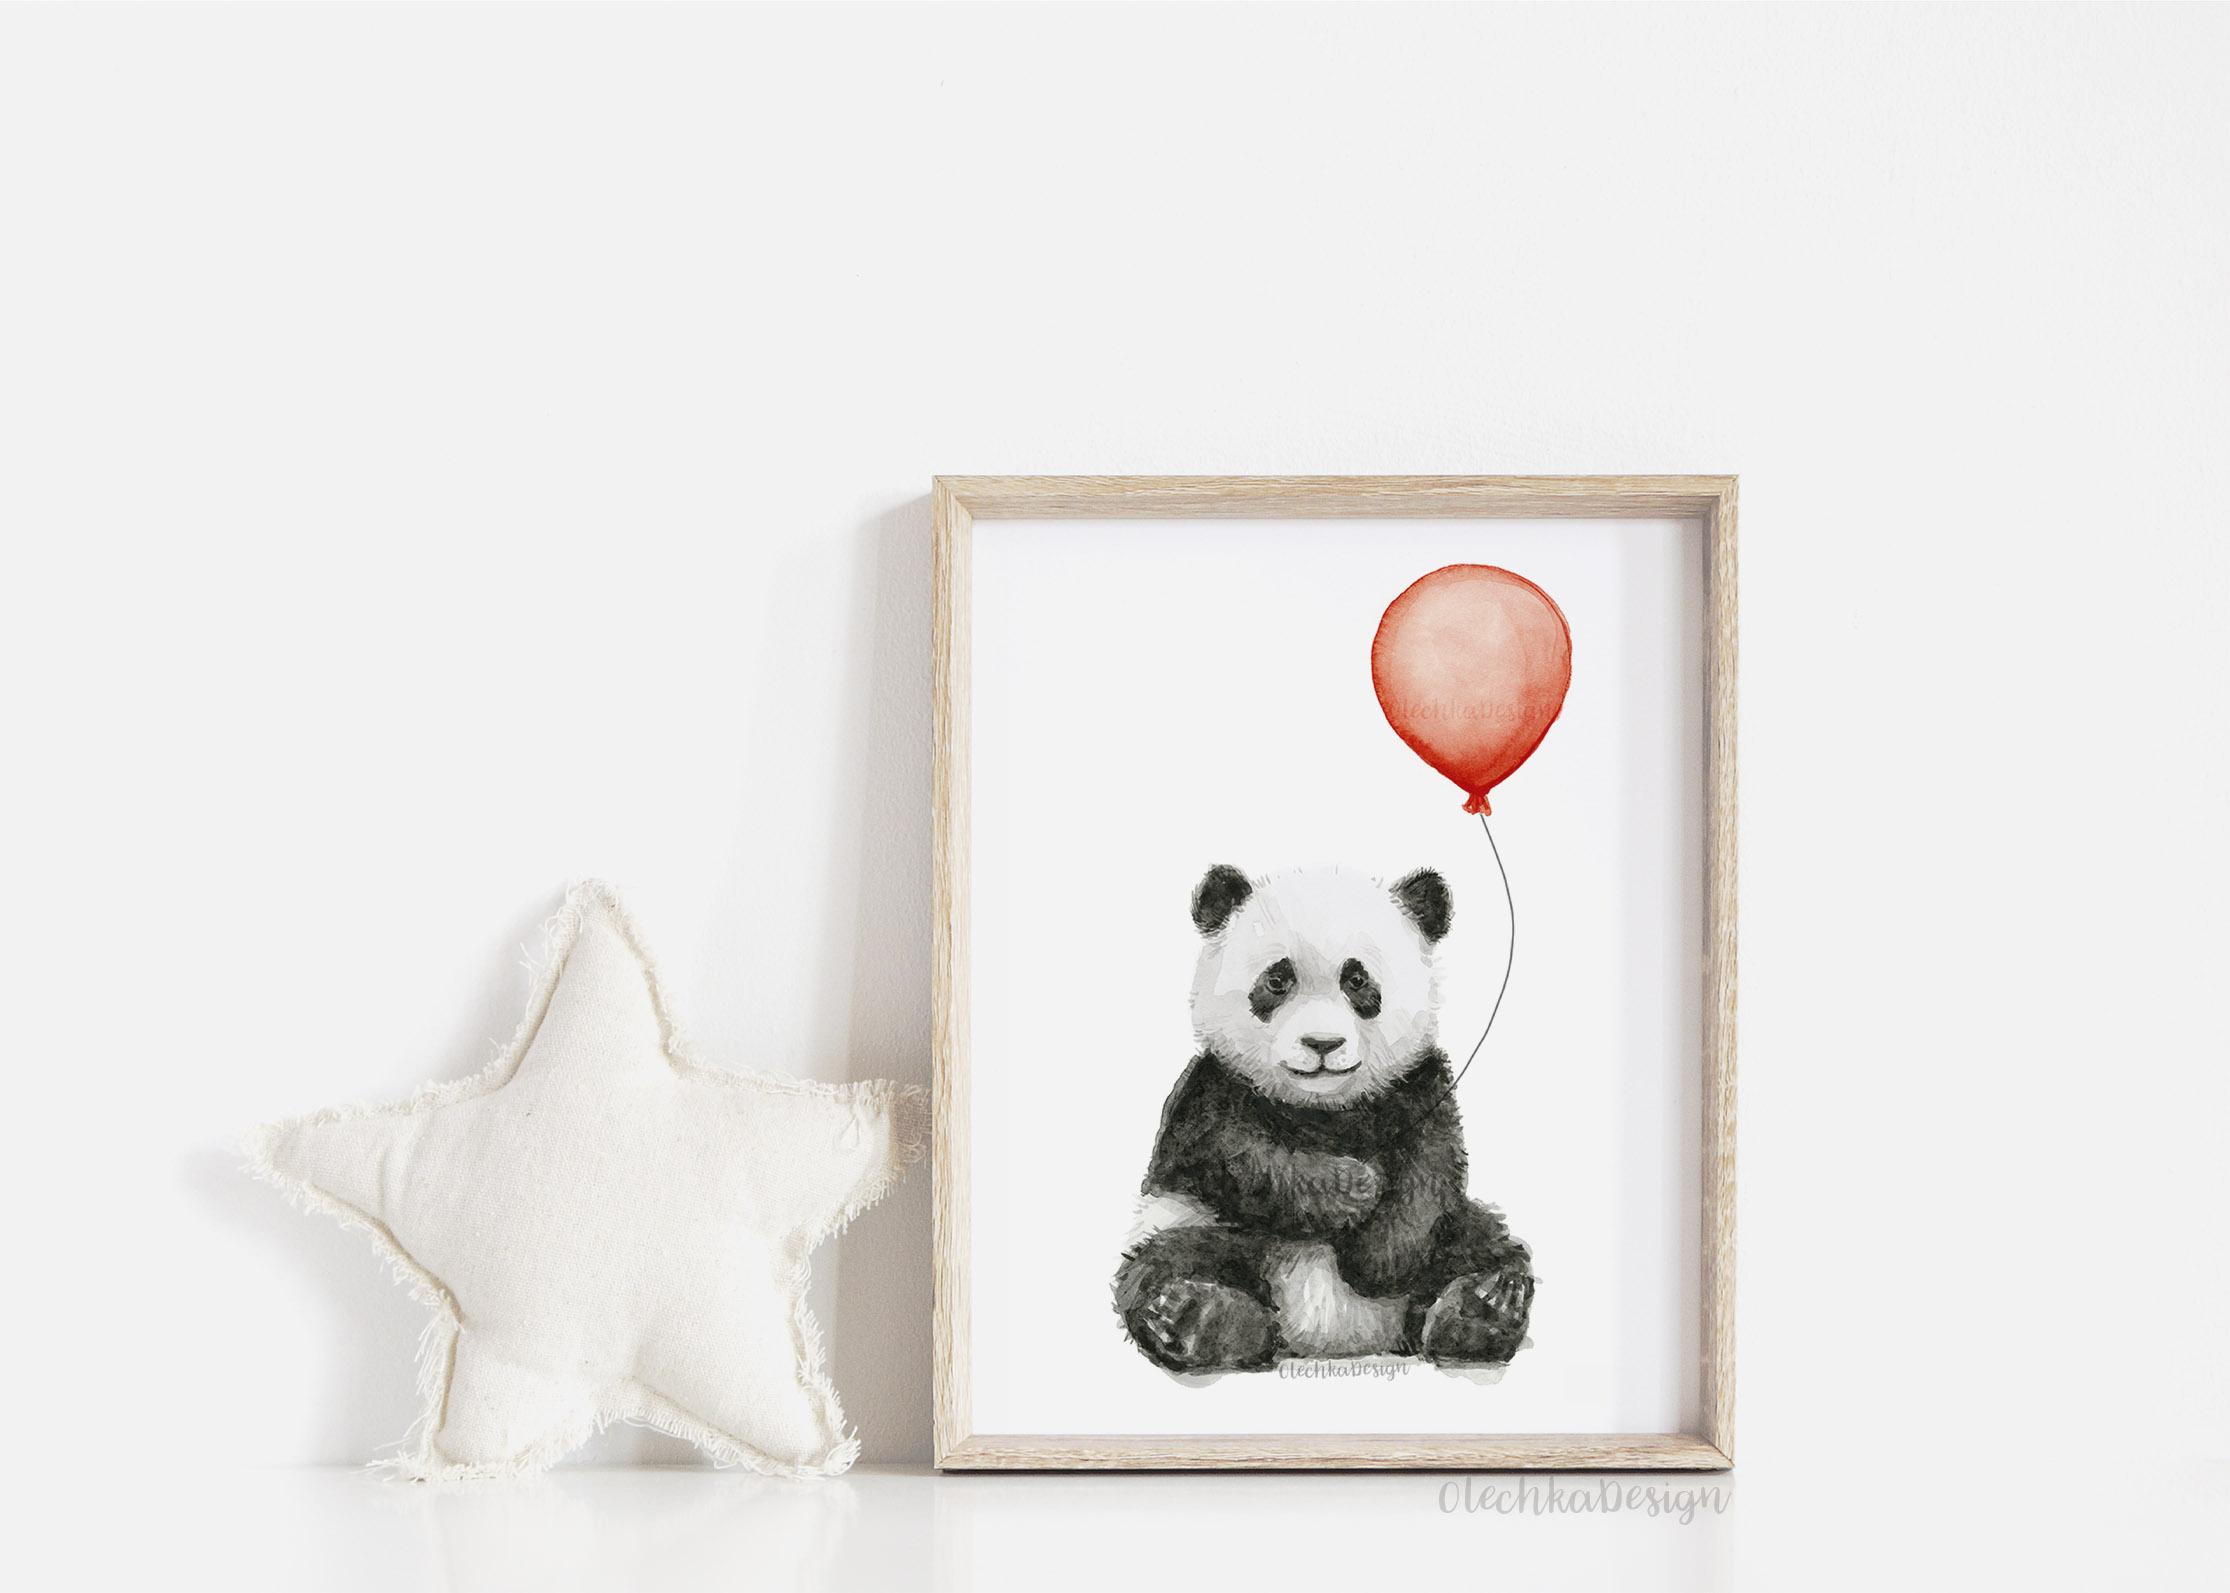 panda-baby-balloon-red-art.jpg